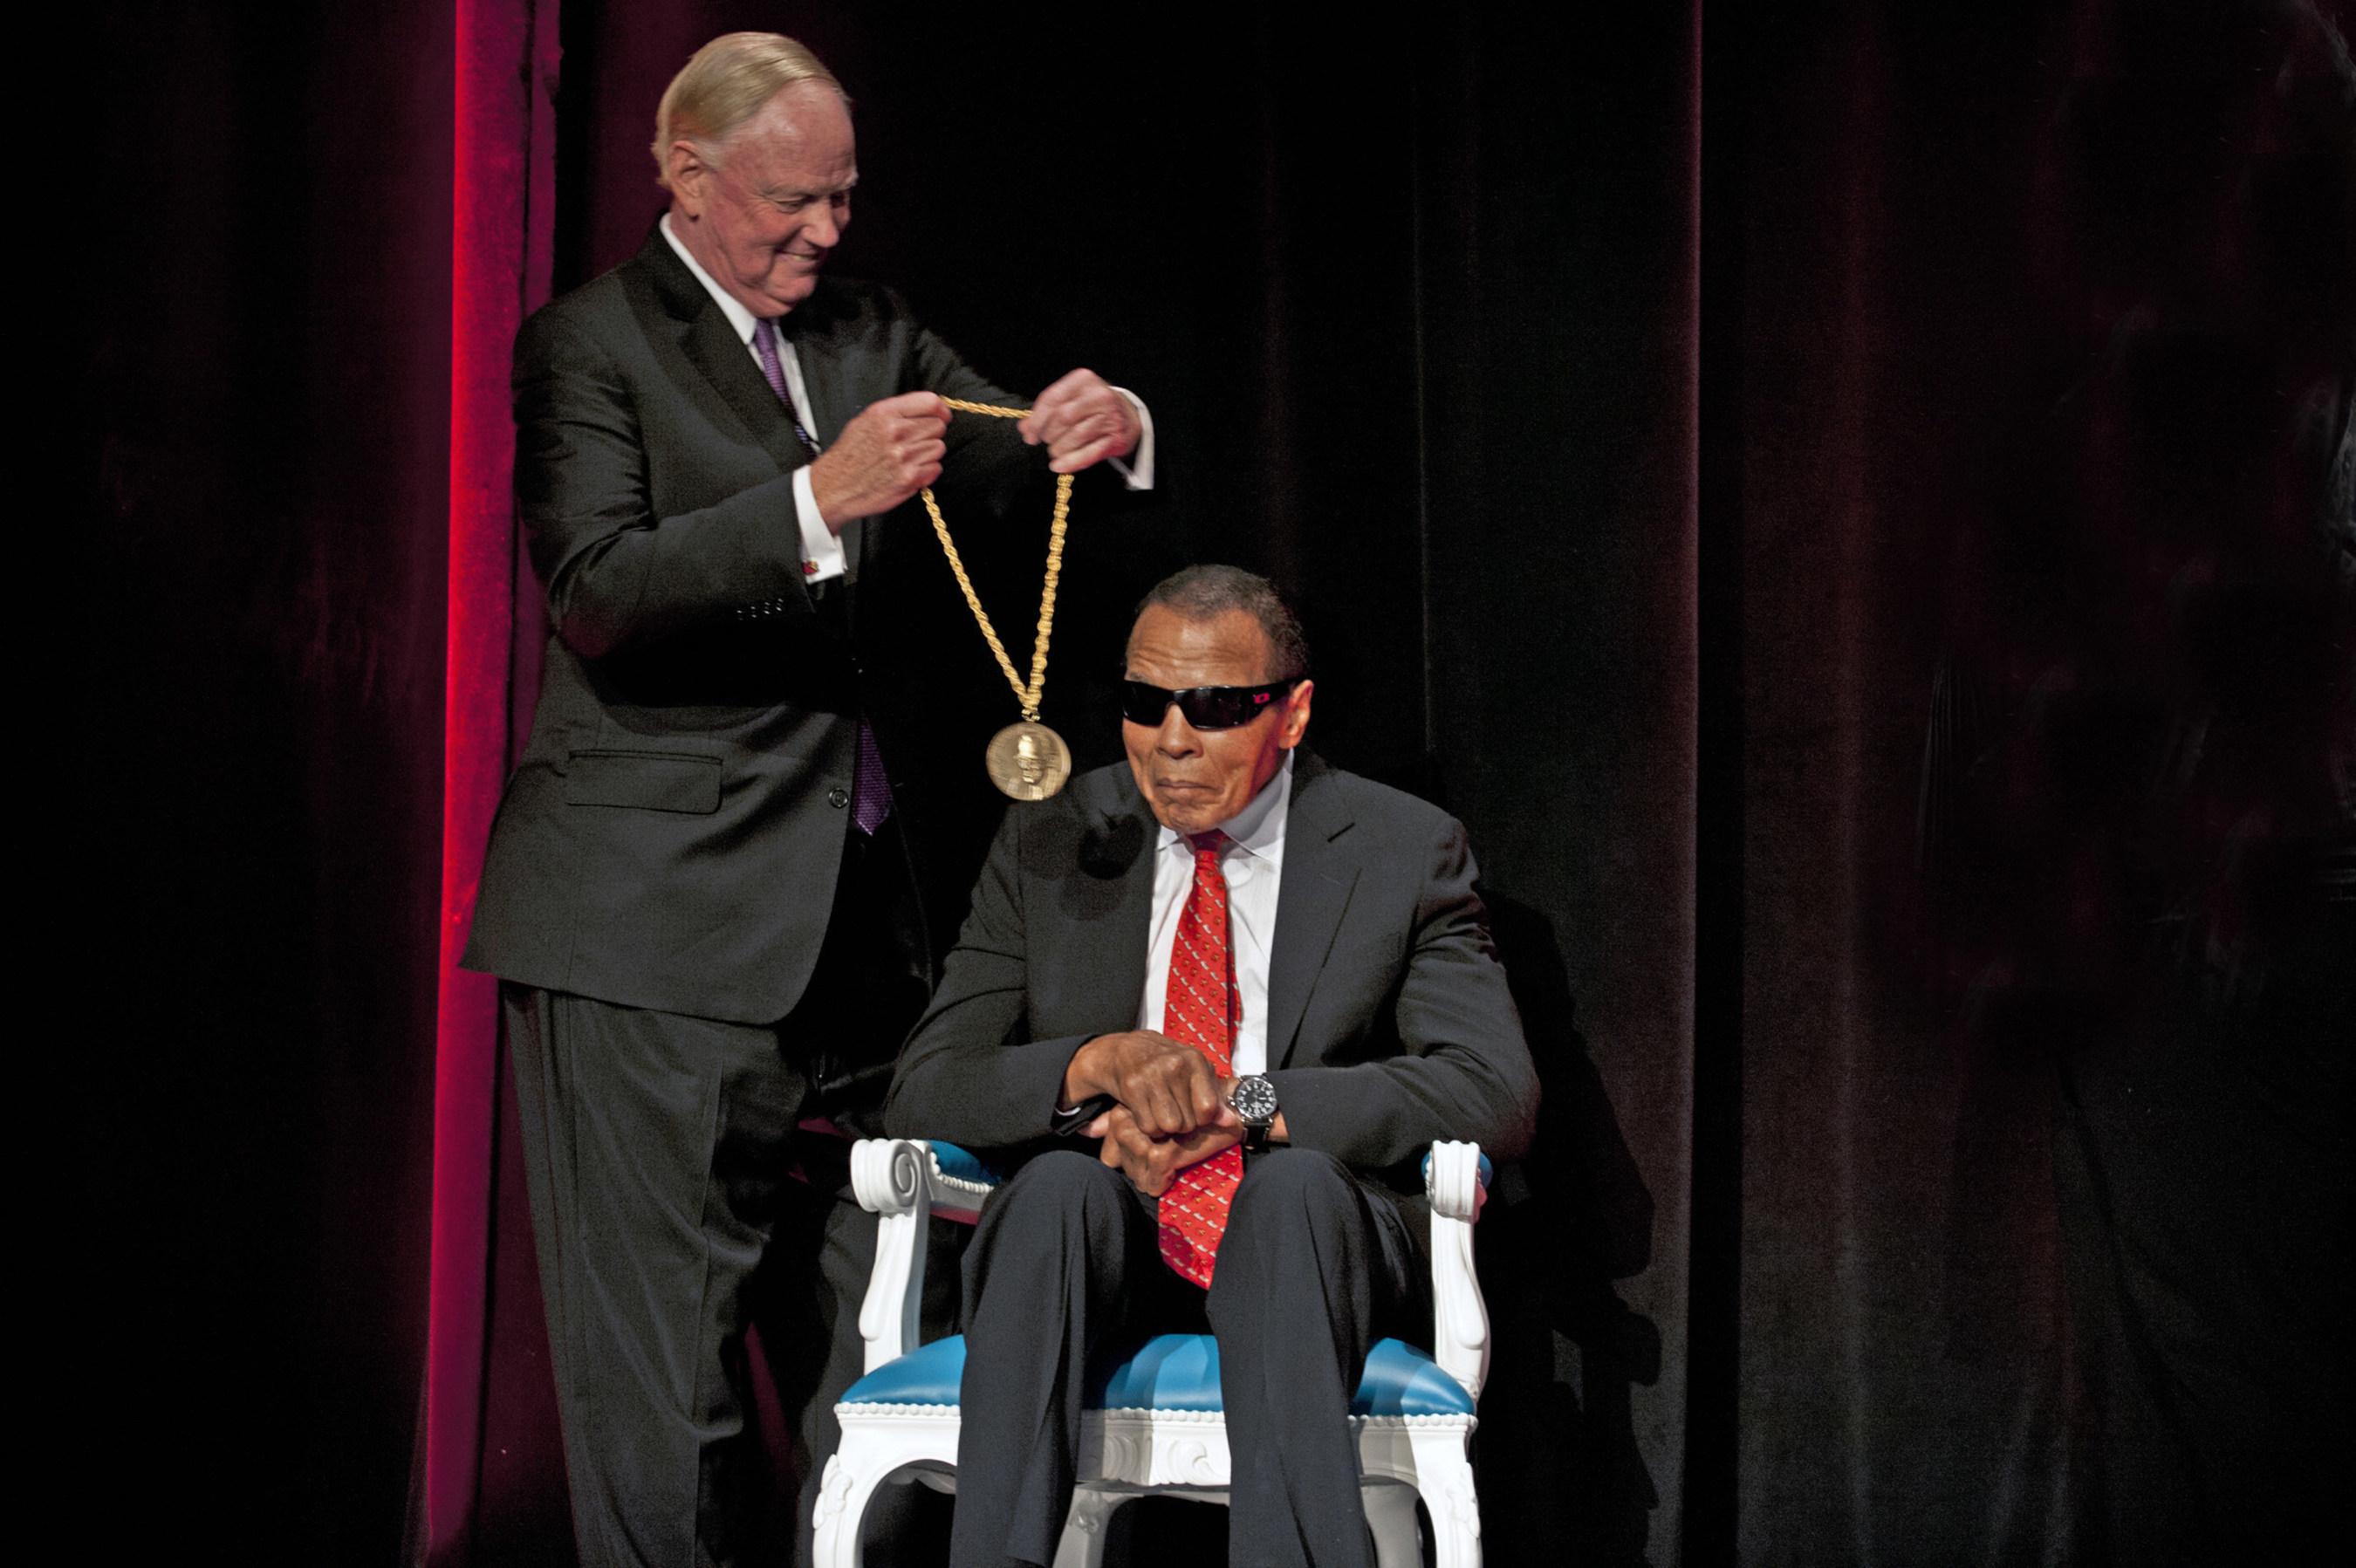 University of Louisville vergibt Grawemeyer Spirit Award an Muhammad Ali